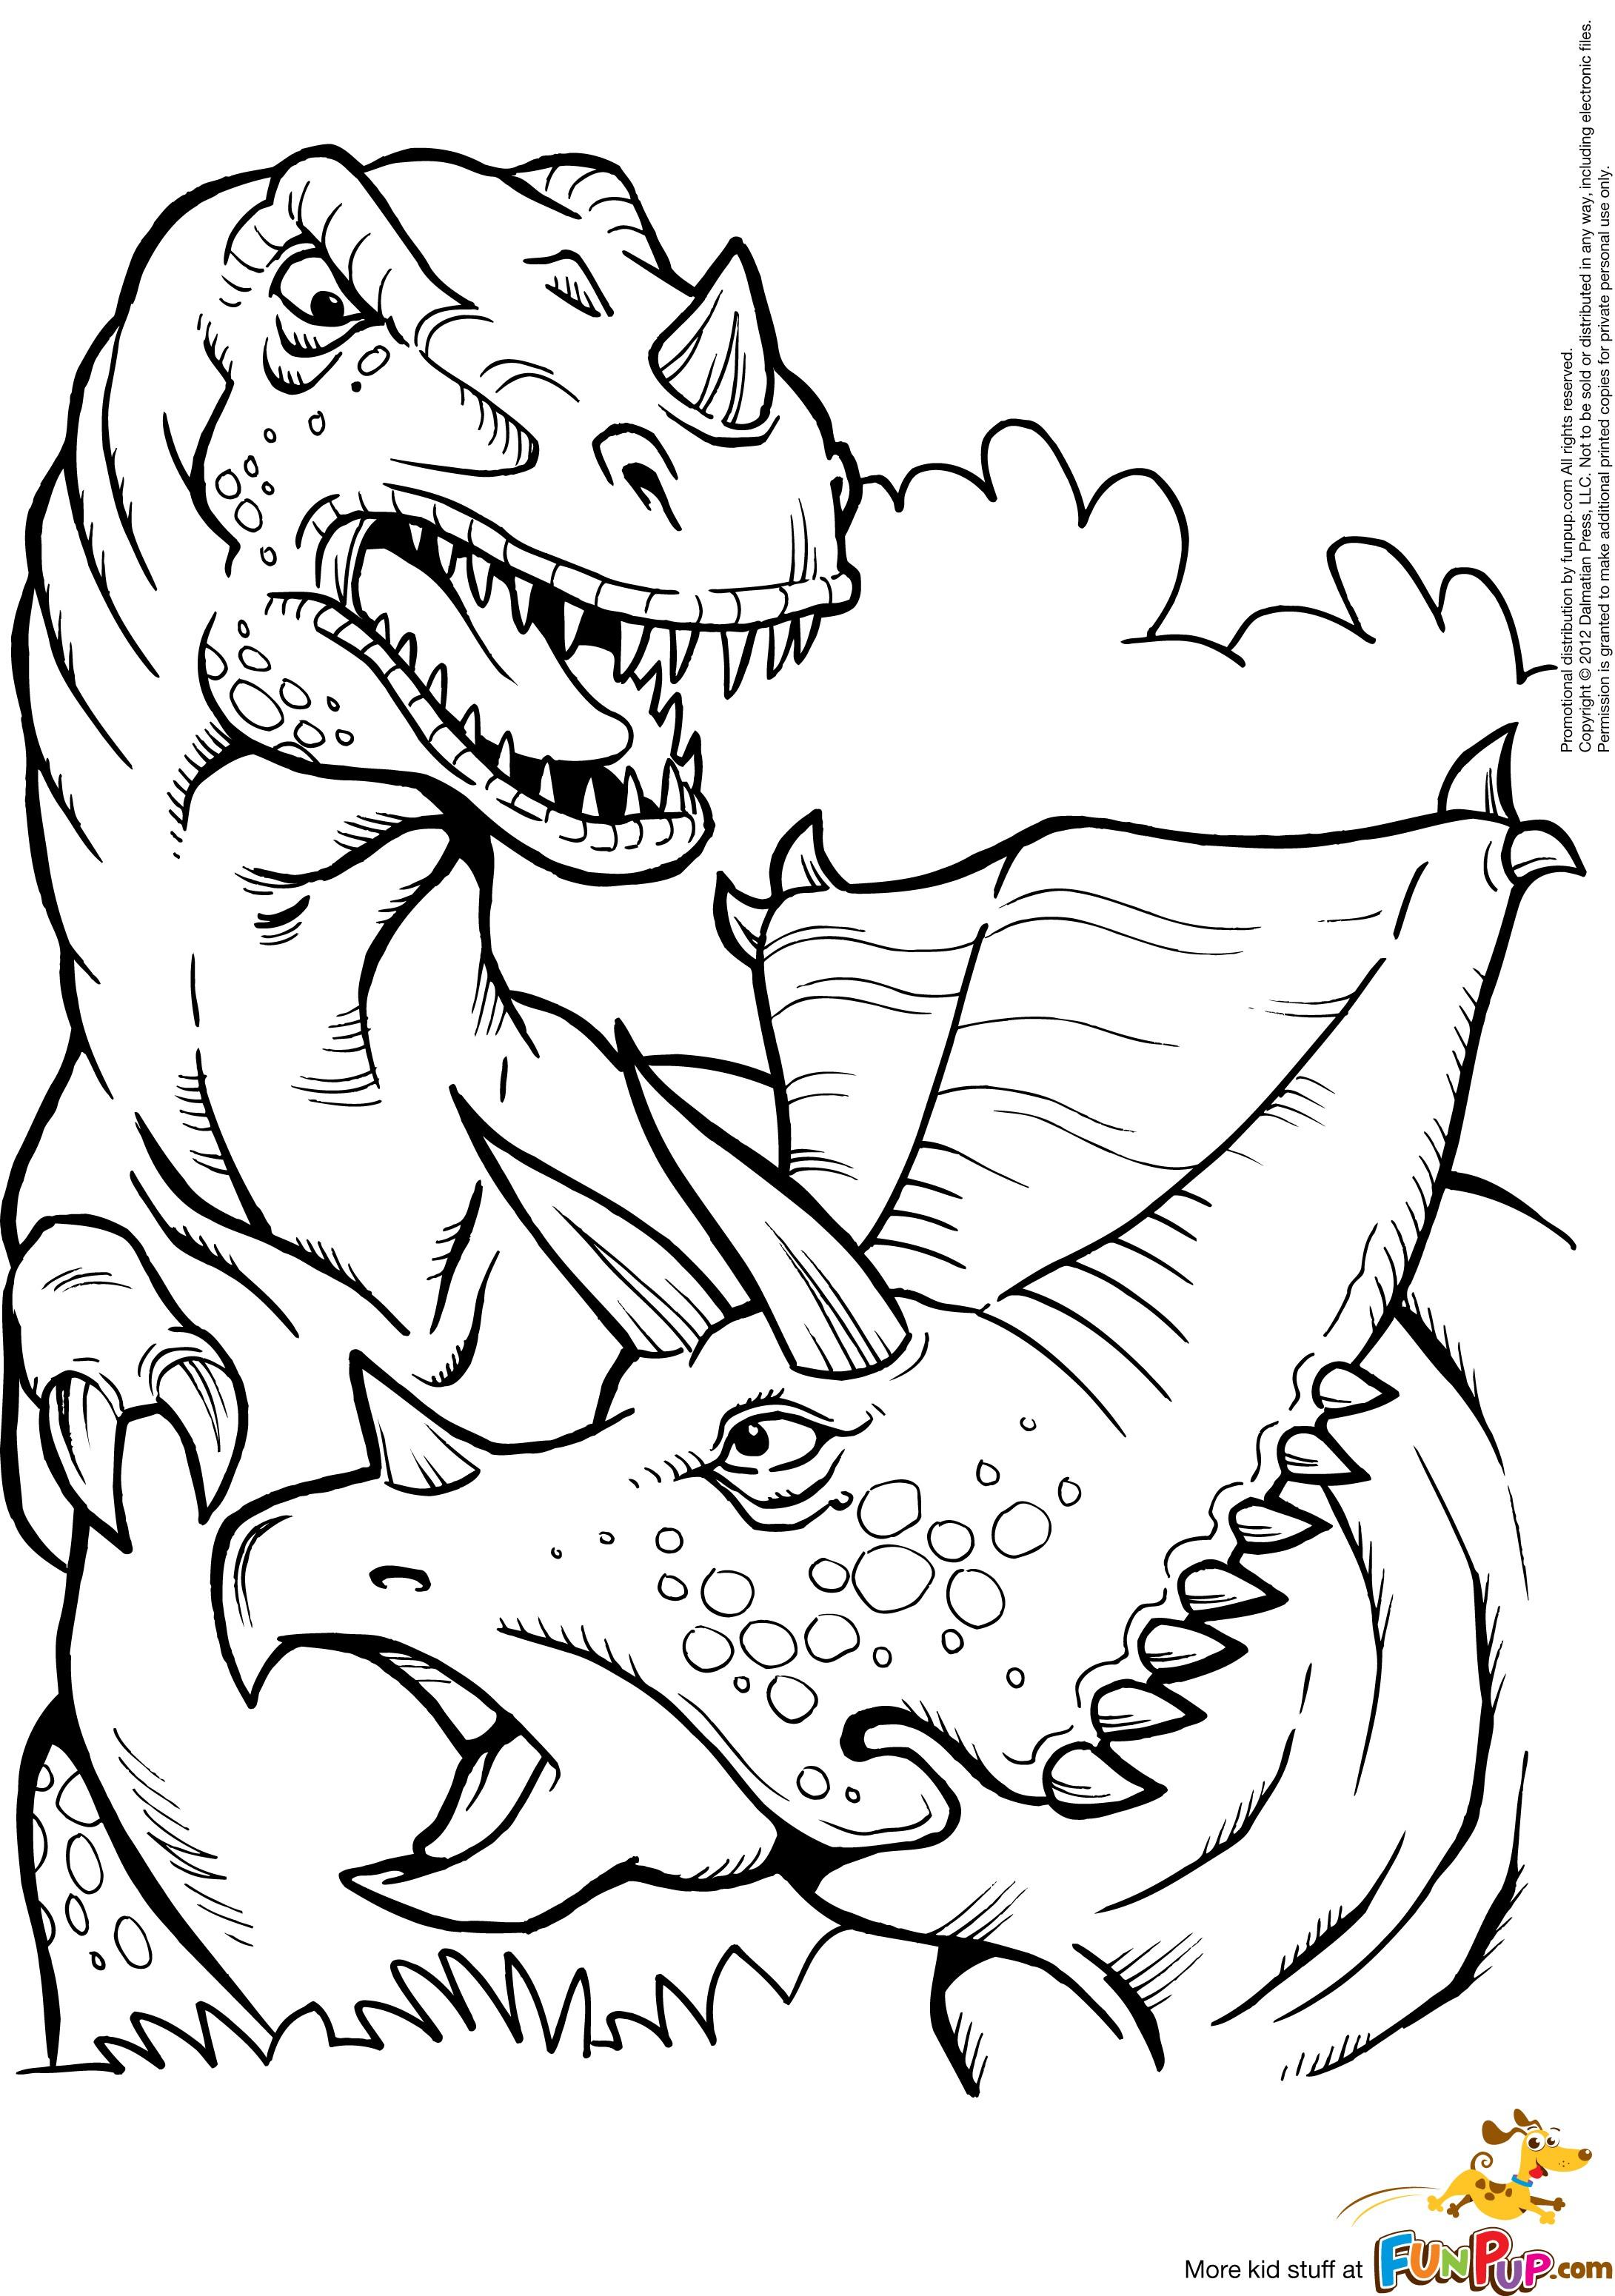 2181x3101 Free Printable Kids Coloring Pages Dinosaurs Trex T Rex Dinosaur